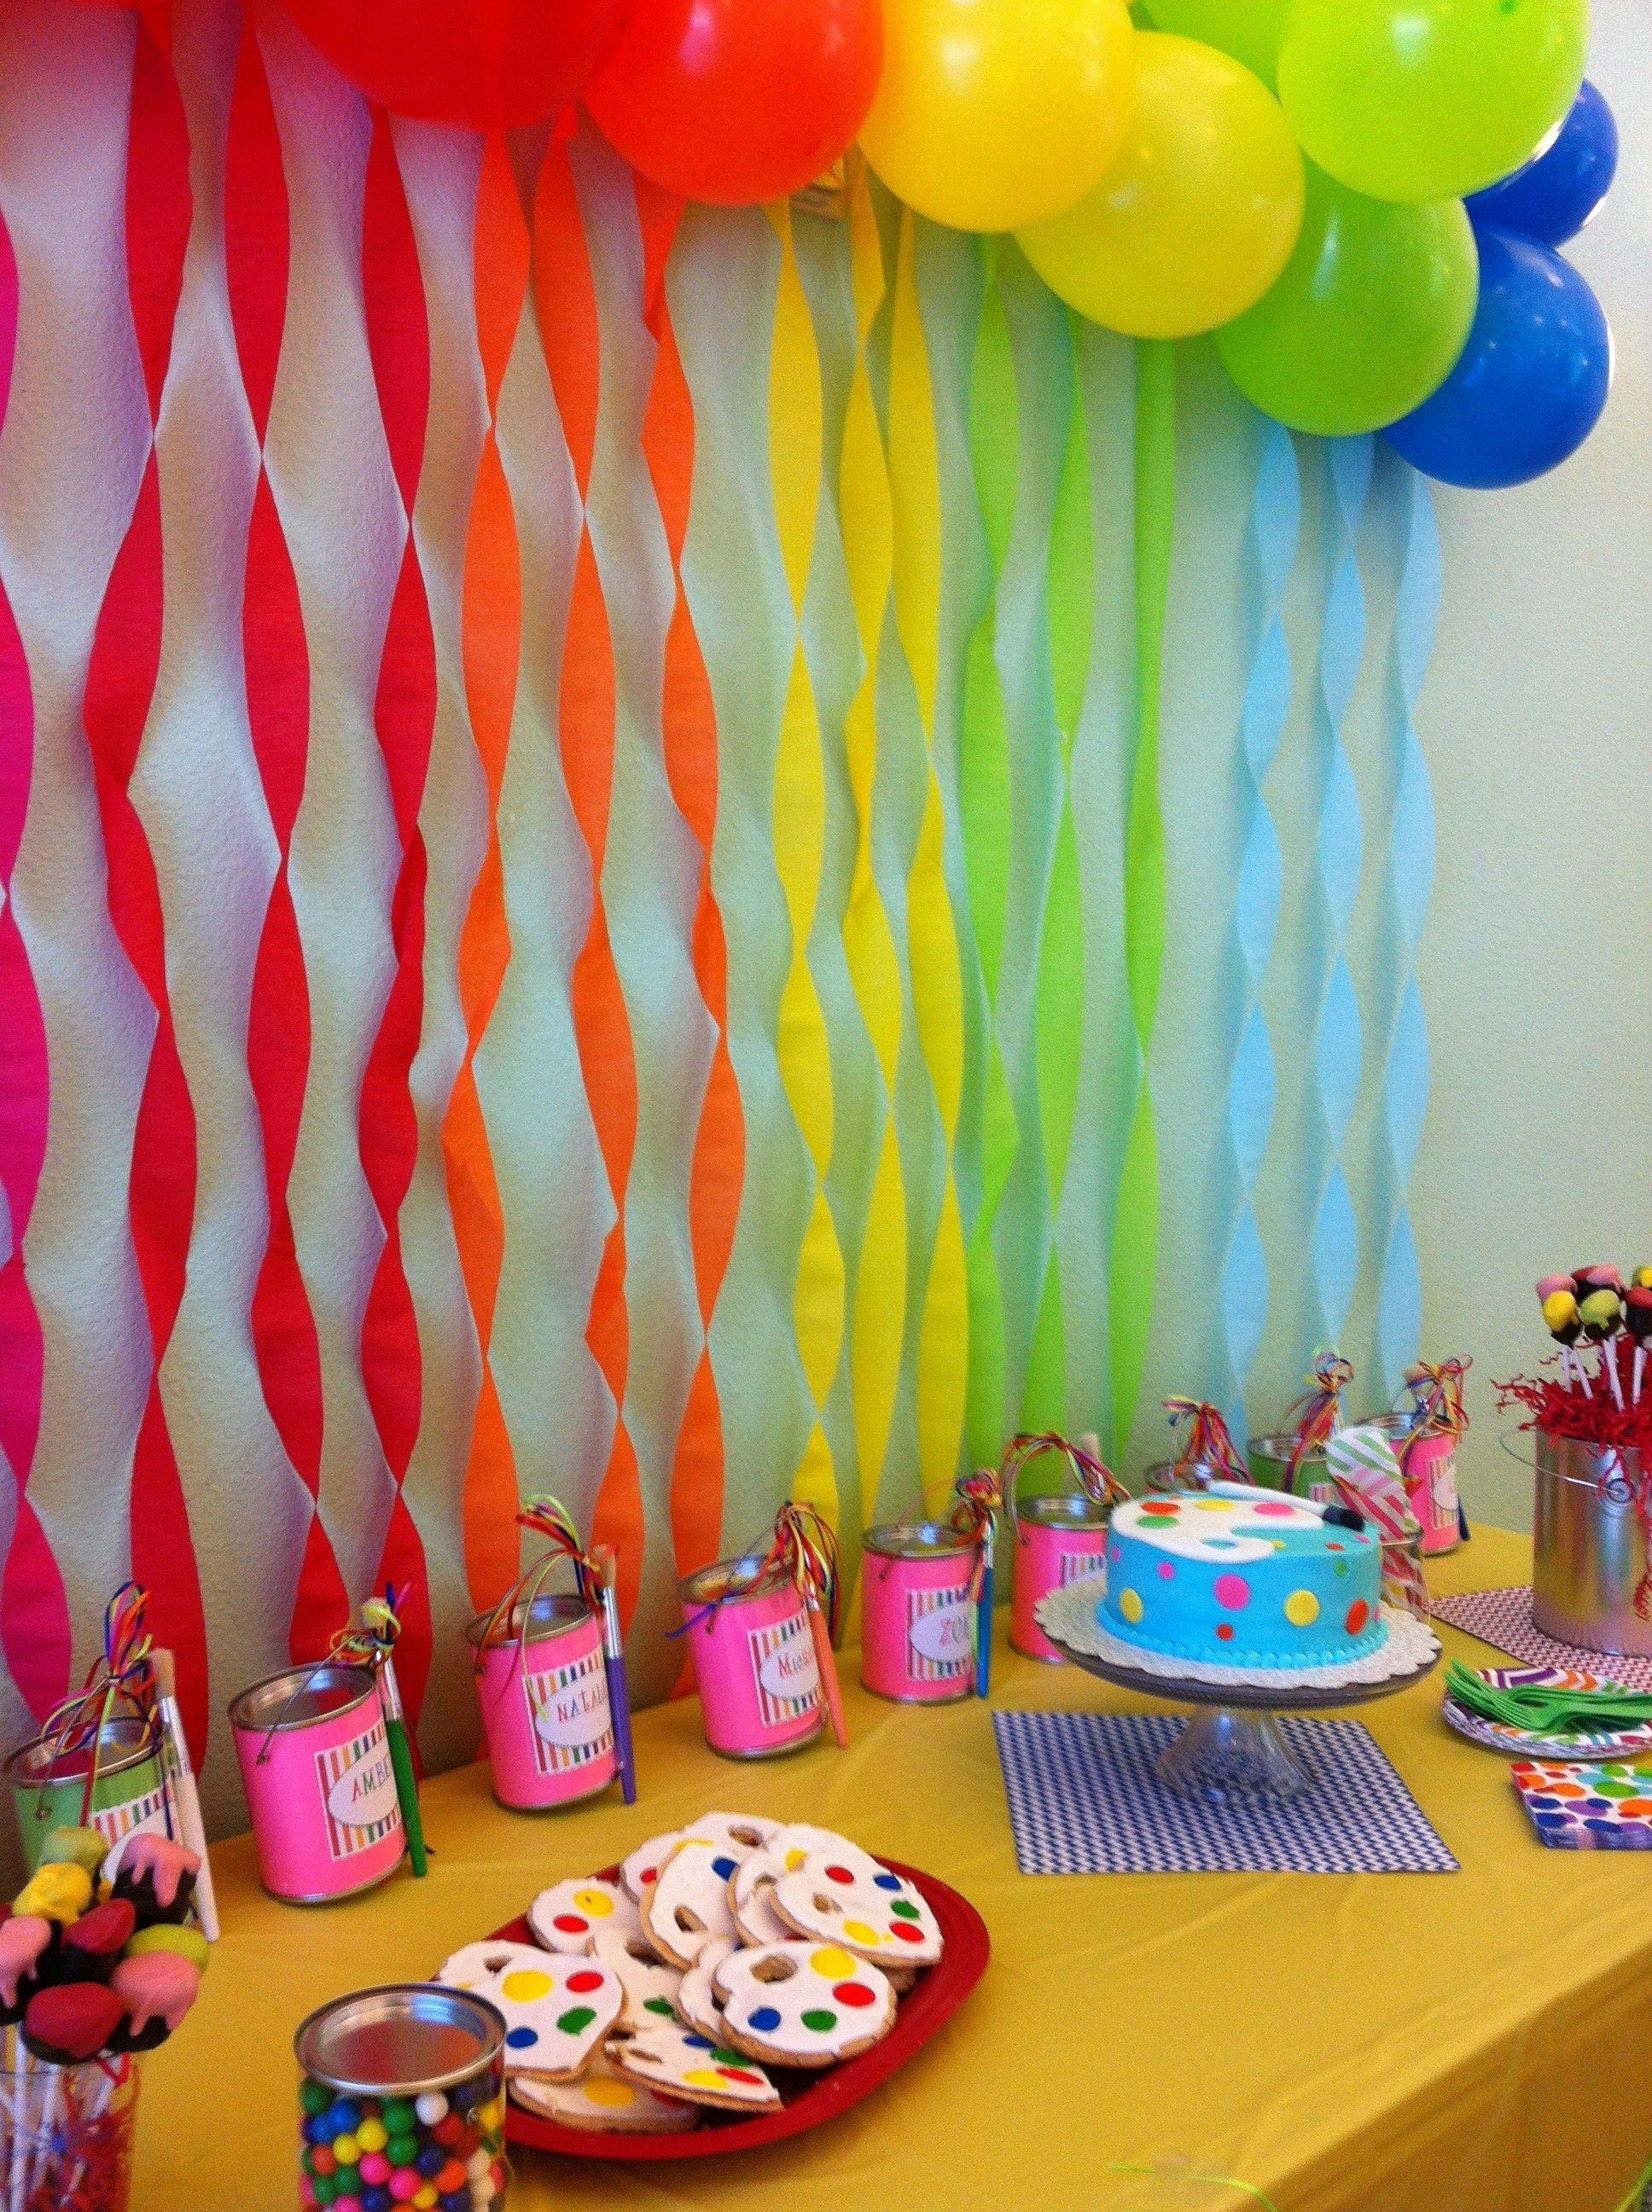 10 Stylish 7 Yr Old Boy Birthday Party Ideas 28 contemporary inspiration around 8 year old birthday party ideas 2021